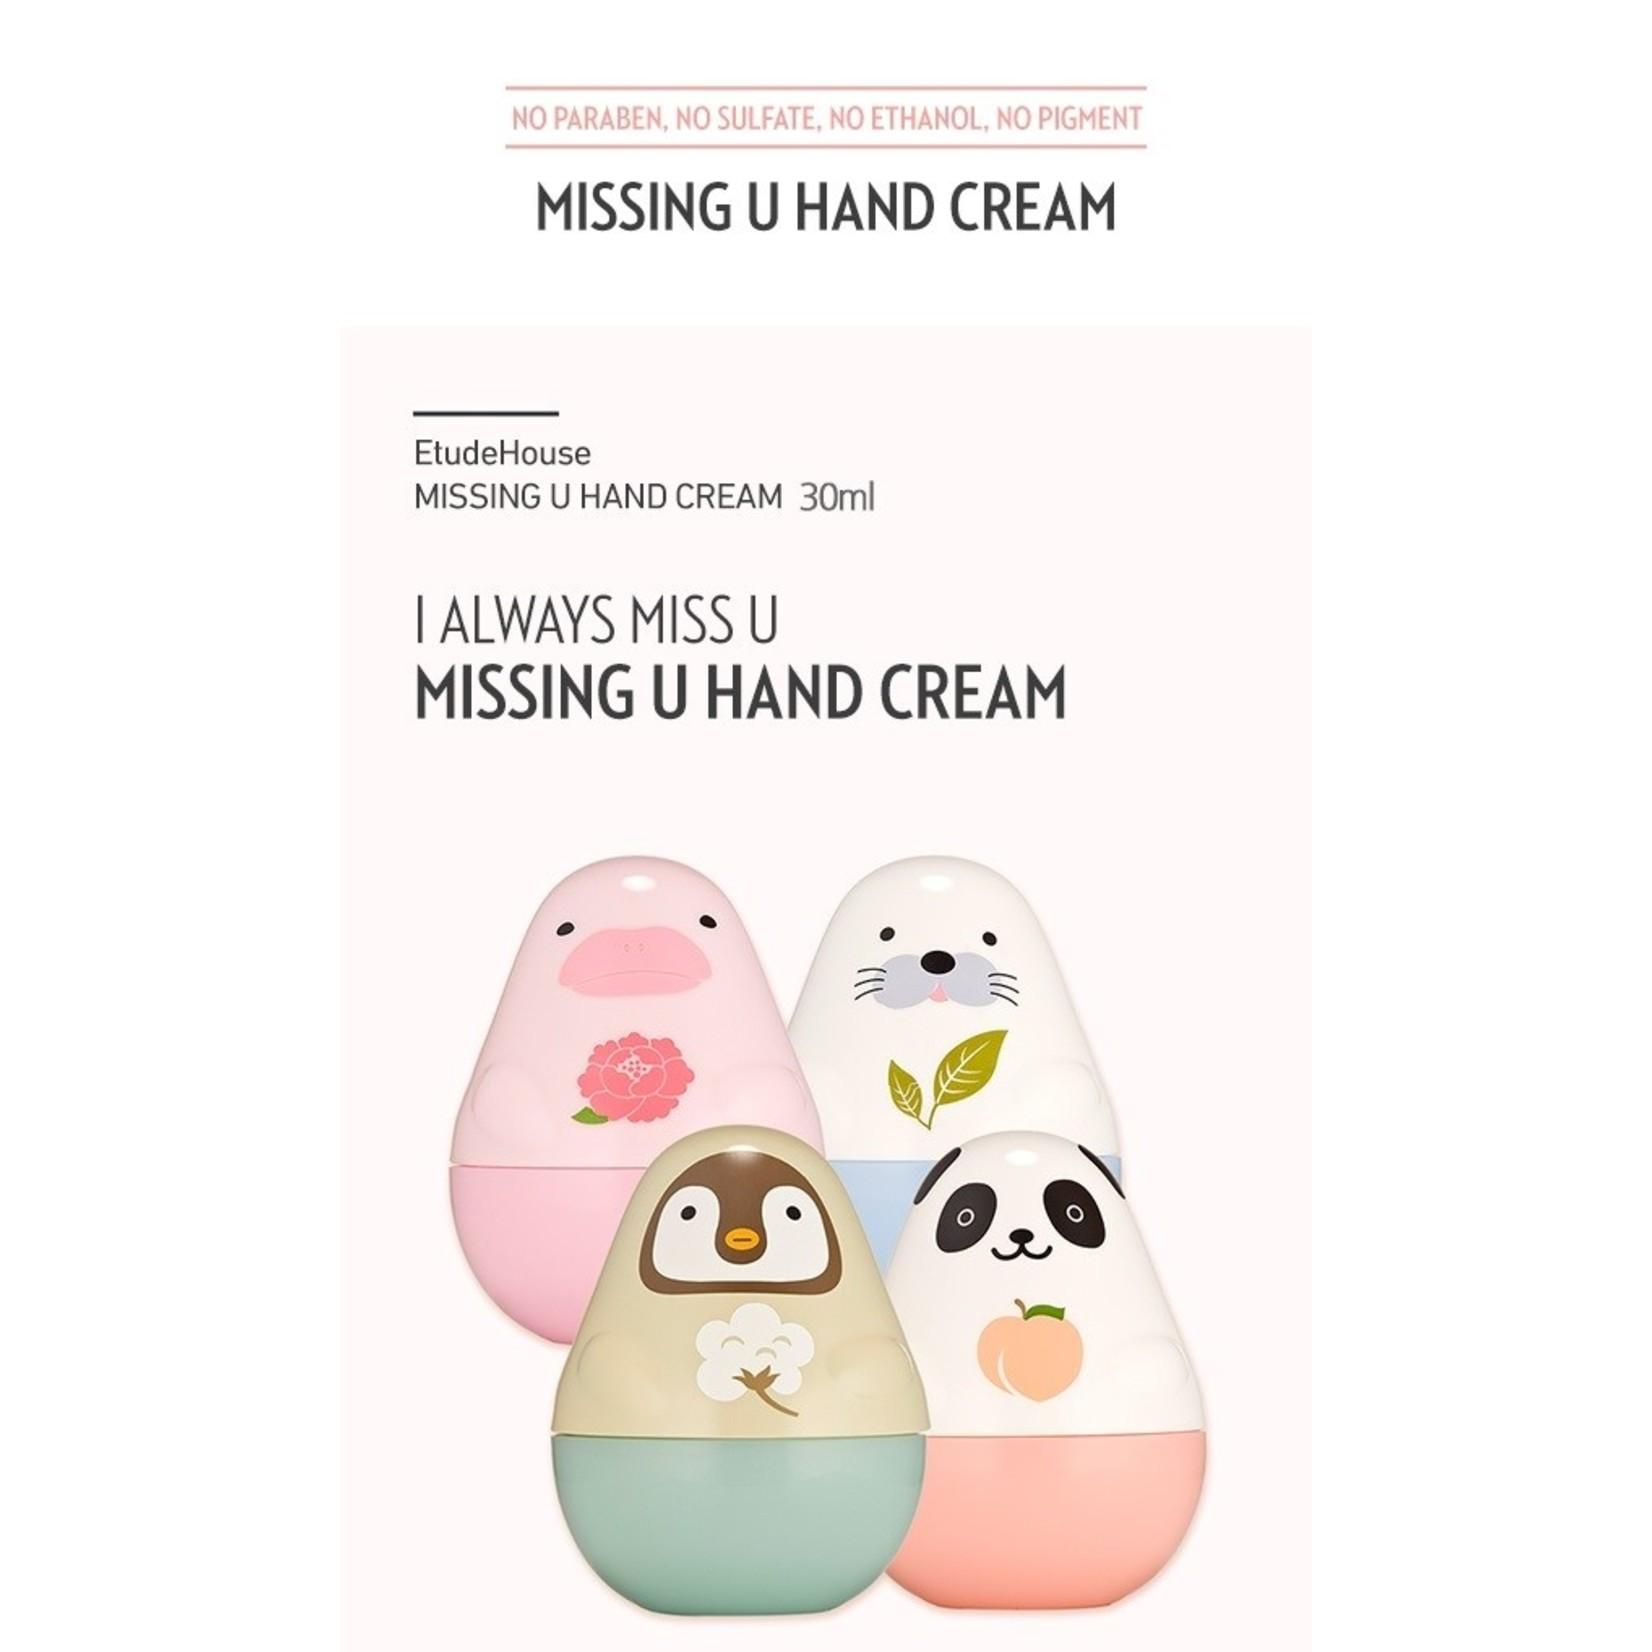 Etude House Missing U Hand Cream #4 Pink Dolphin